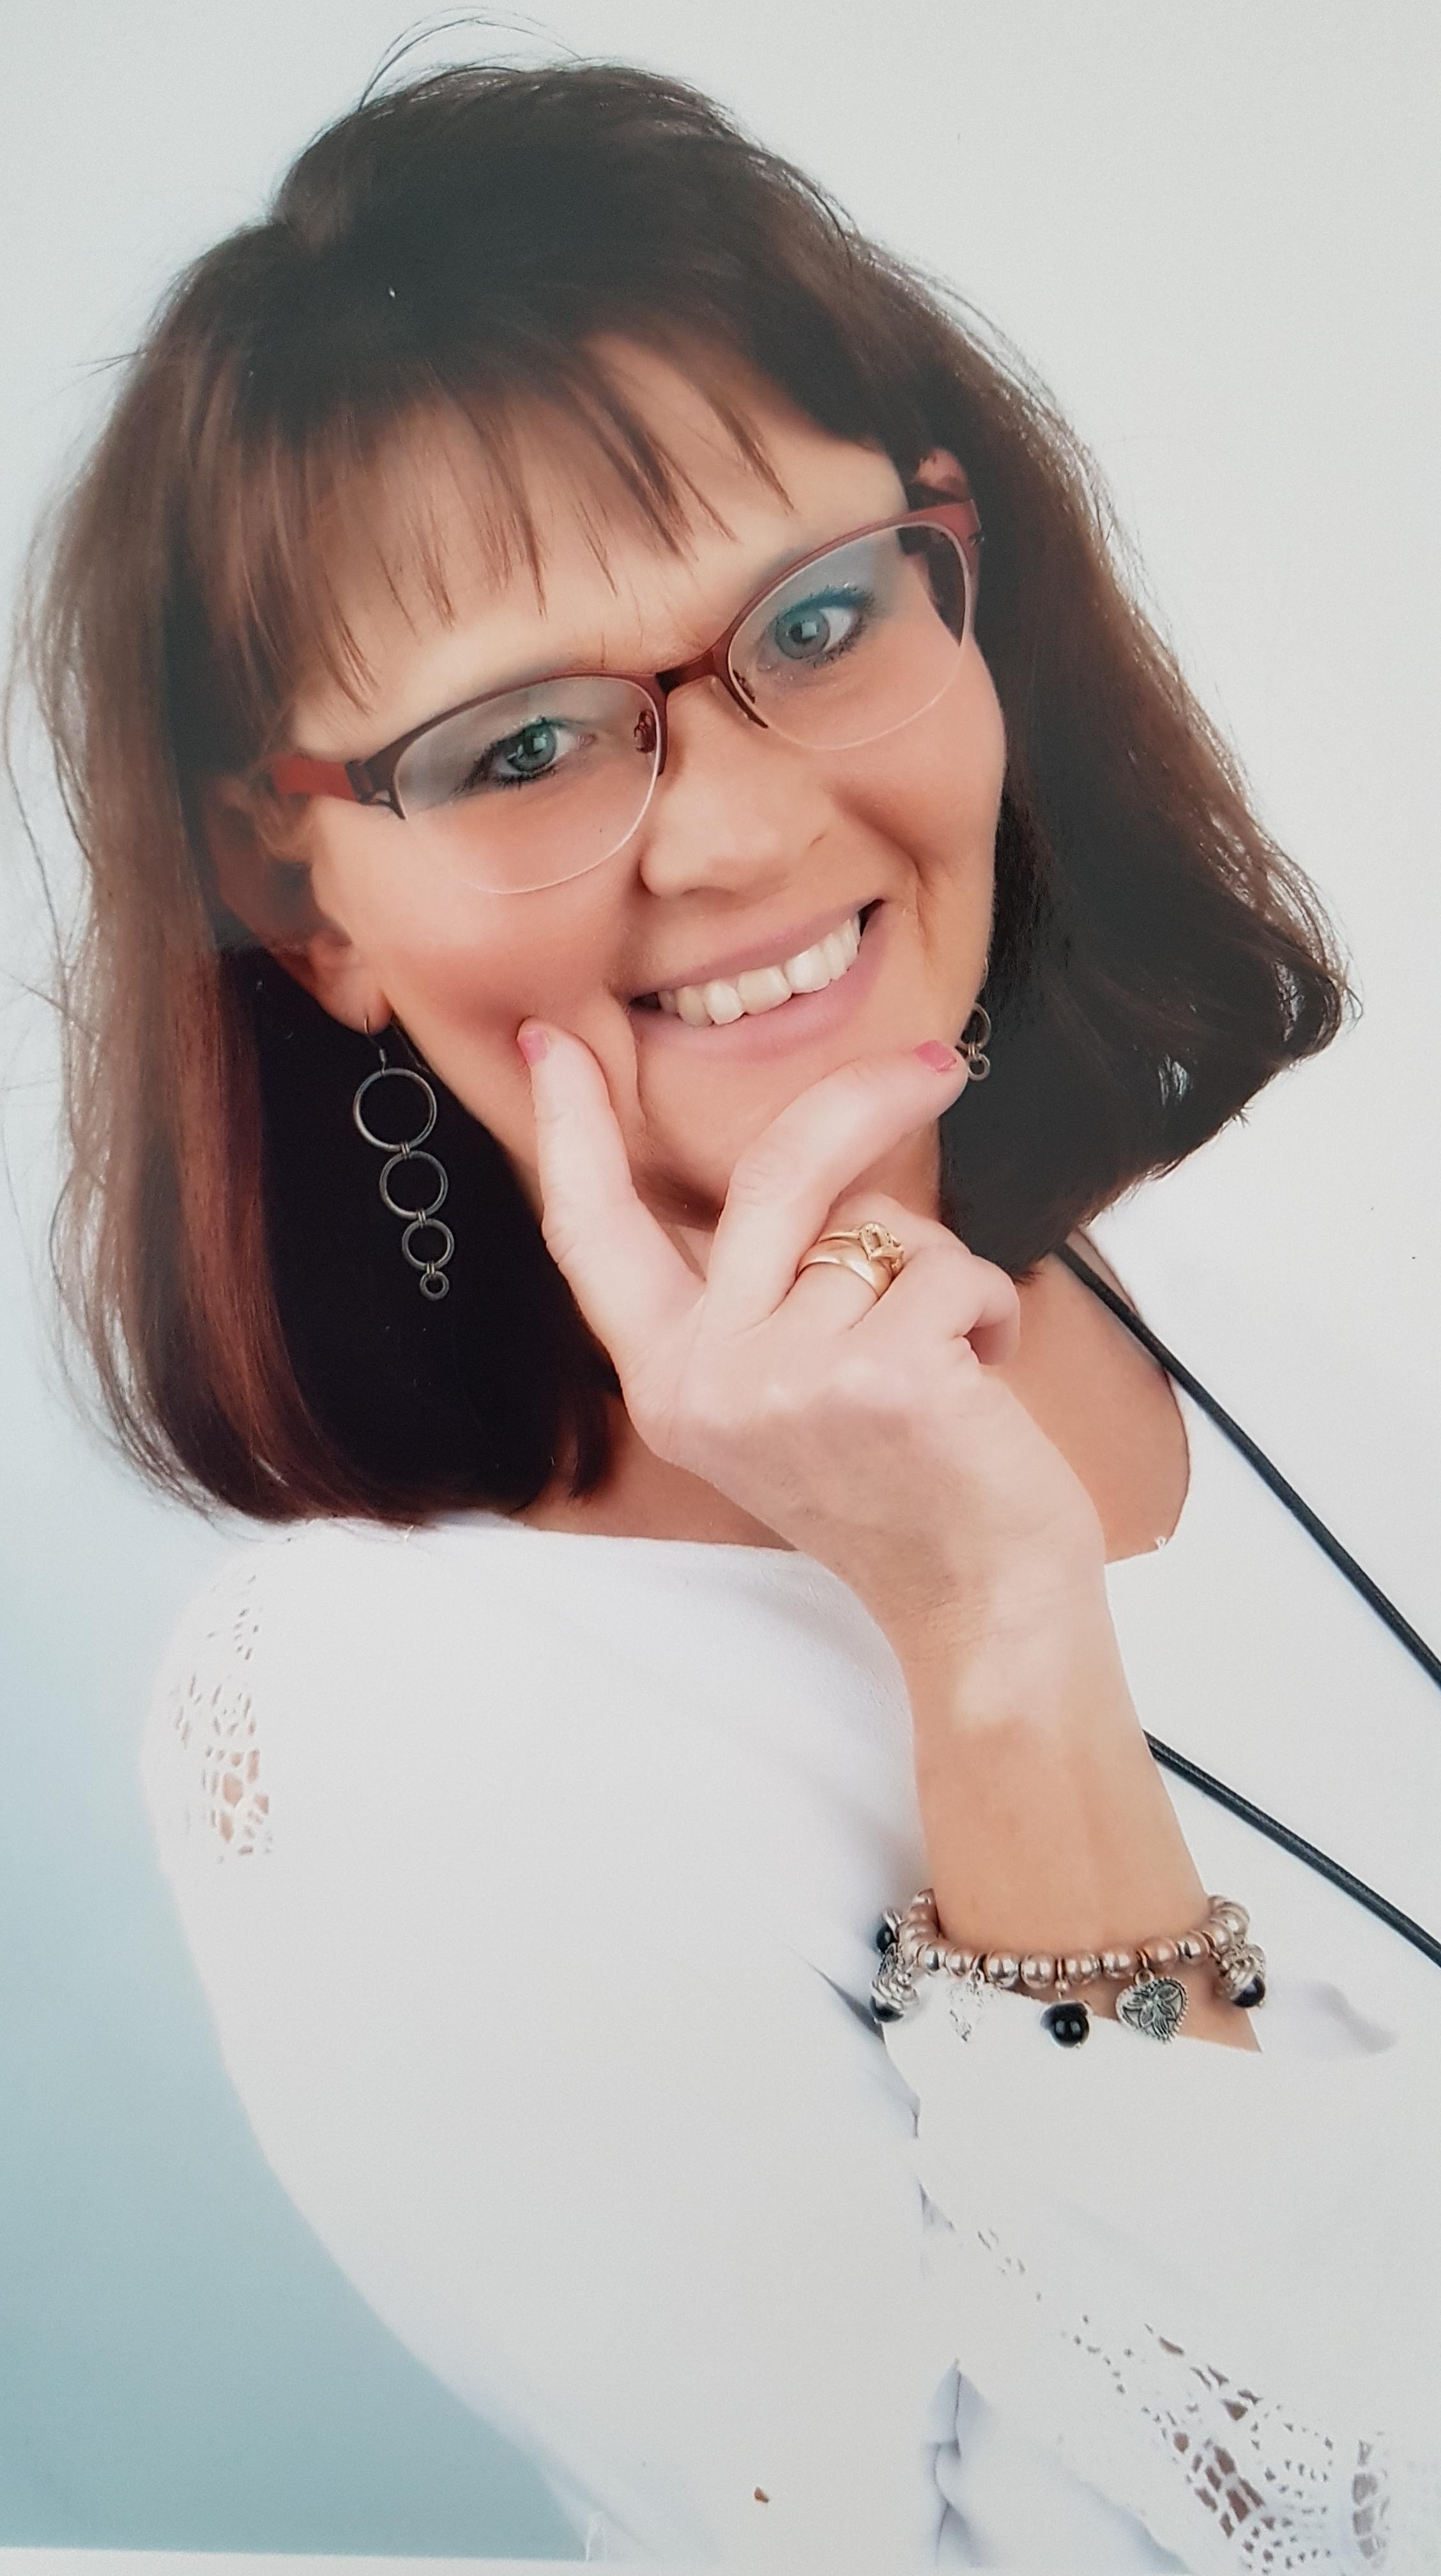 Carola Claesson de Beau, Karuna Reiki® Master Holy Fire IIl & Certifierat Medium